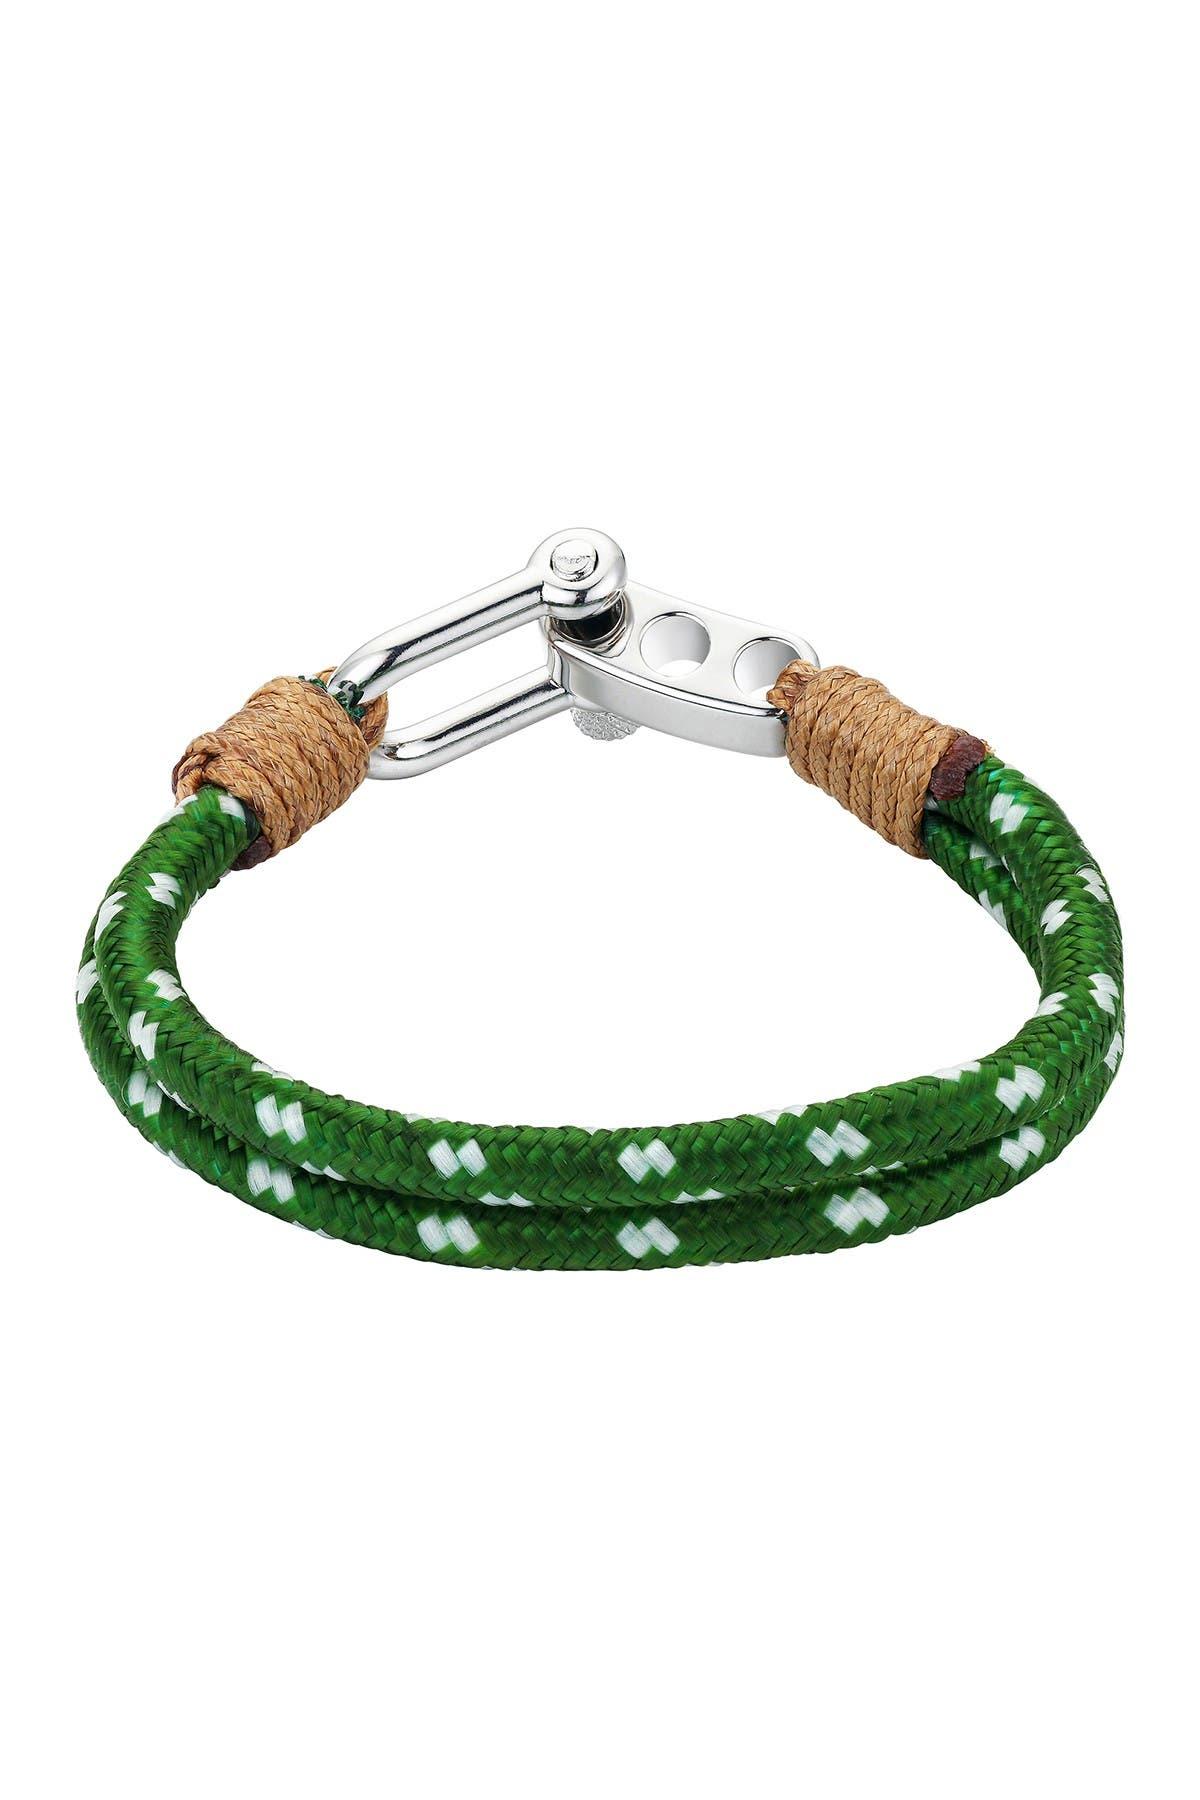 Image of LA Rocks Green & White Cord Paracord Men's Bracelet